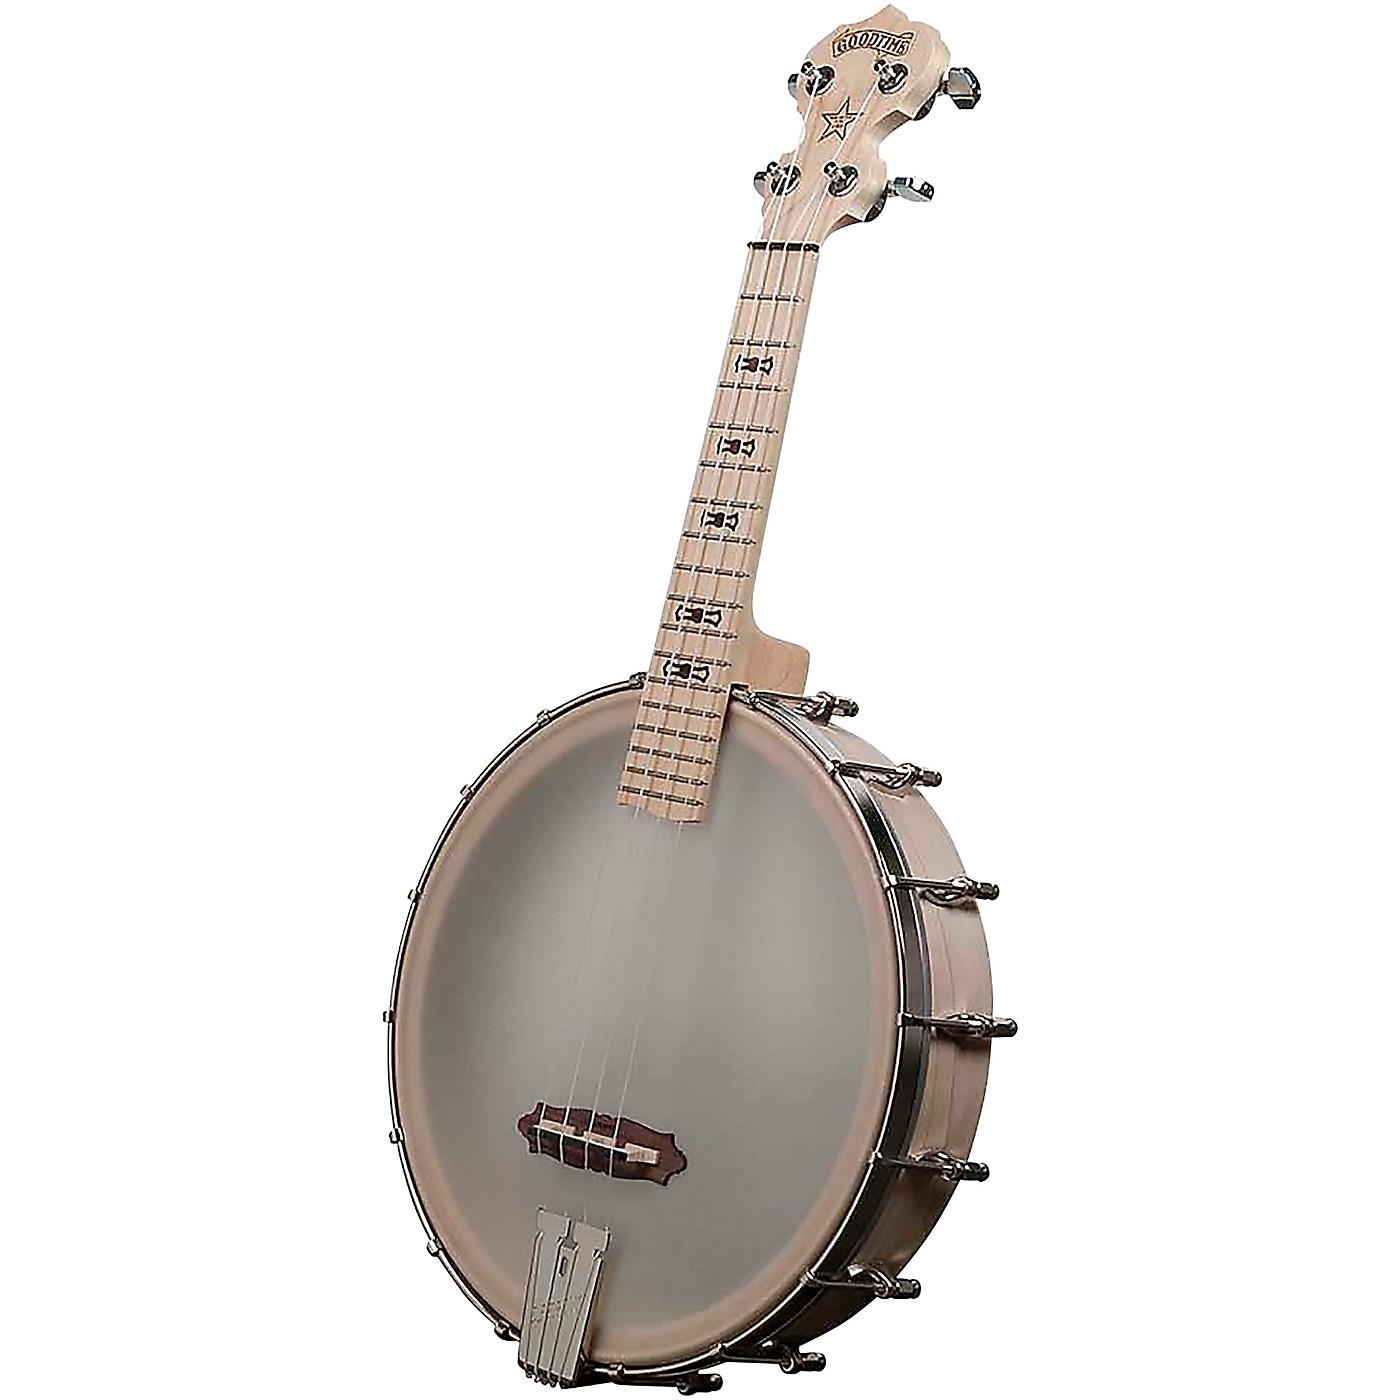 Deering Left-Handed Goodtime Banjo Ukulele thumbnail